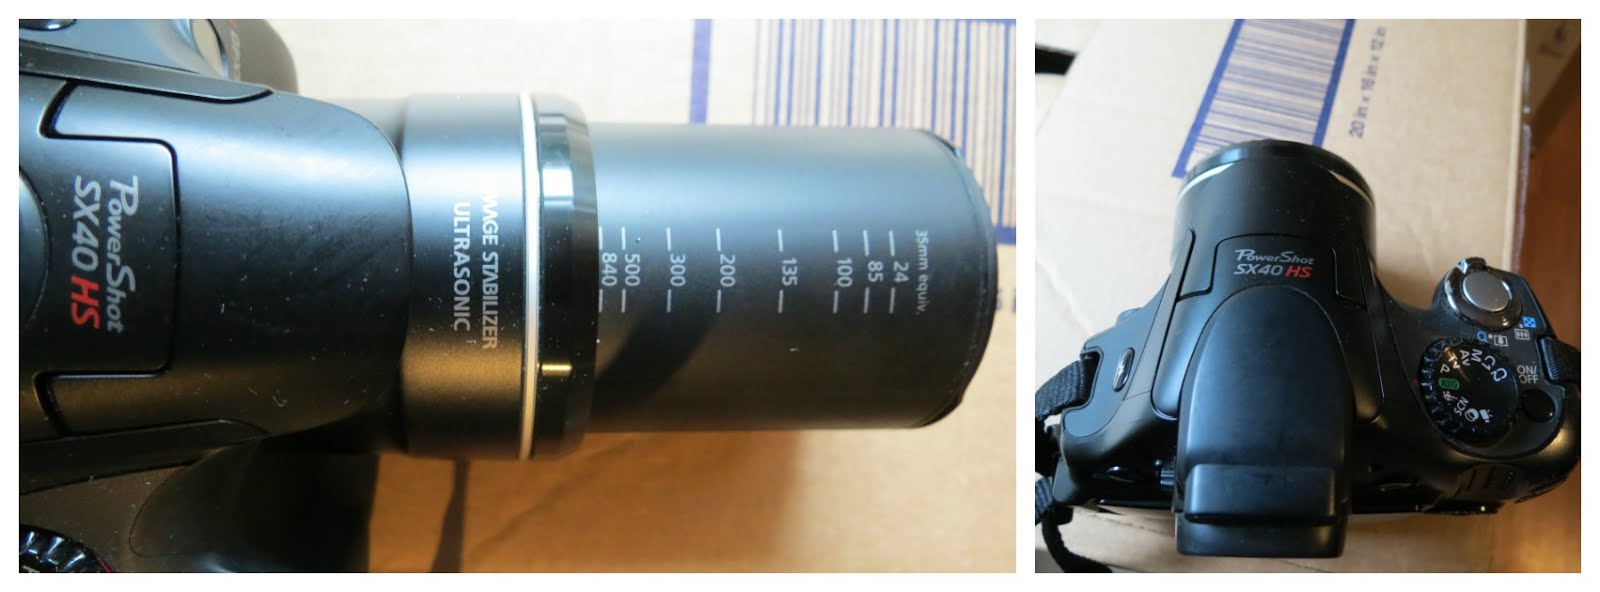 My Camera: Canon Powershot SX40